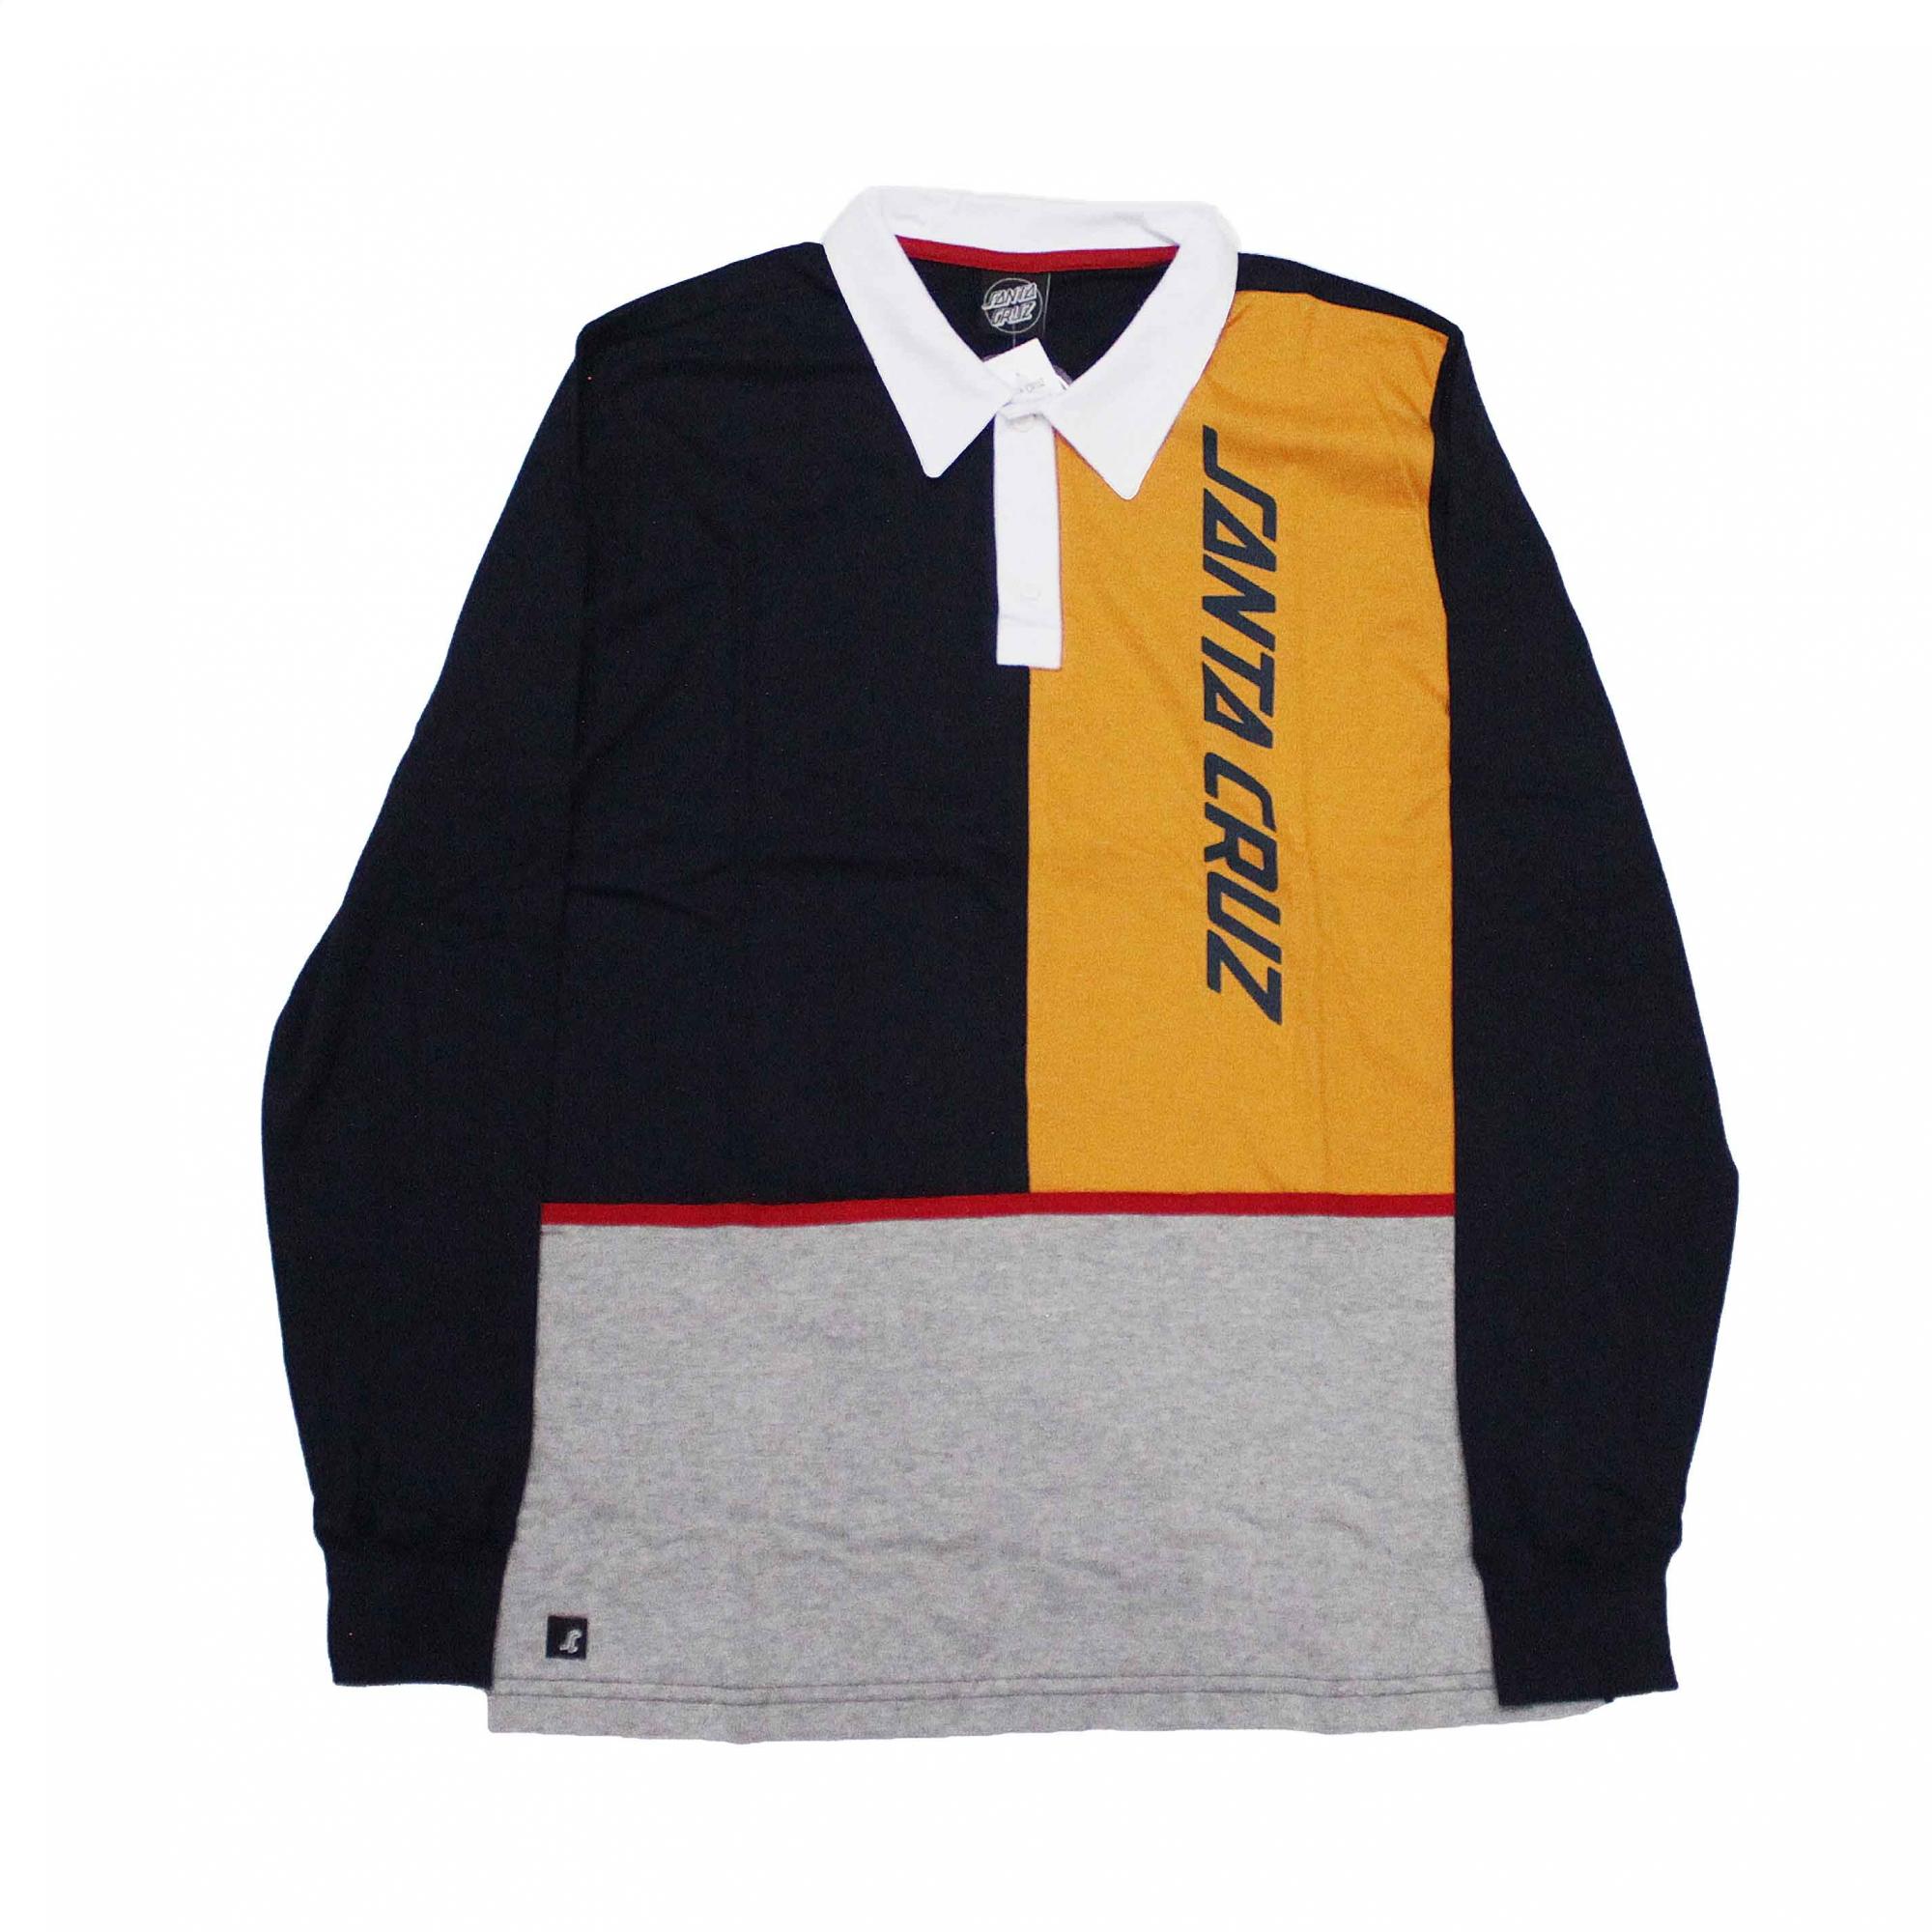 Camiseta Manga Longa Santa Cruz Polo Regulete - Azul Marinho/Amarelo